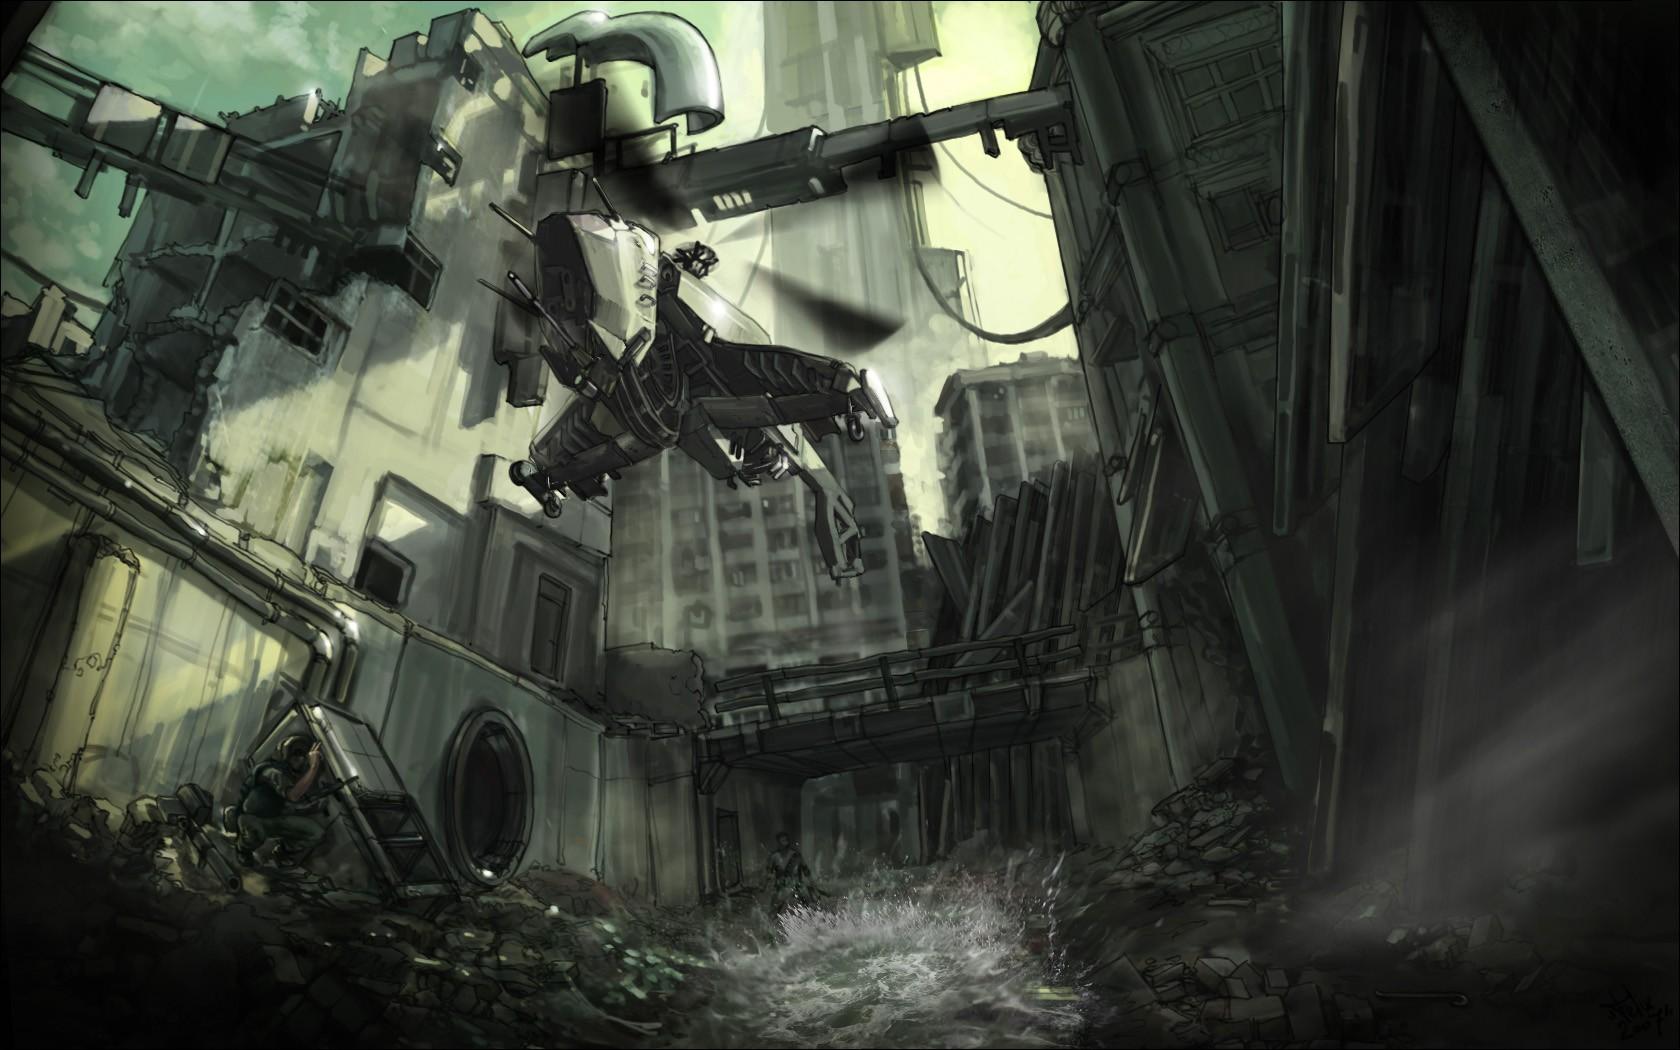 Wallpaper Half Life 2 Helicopter City 17 Citadel Rebels